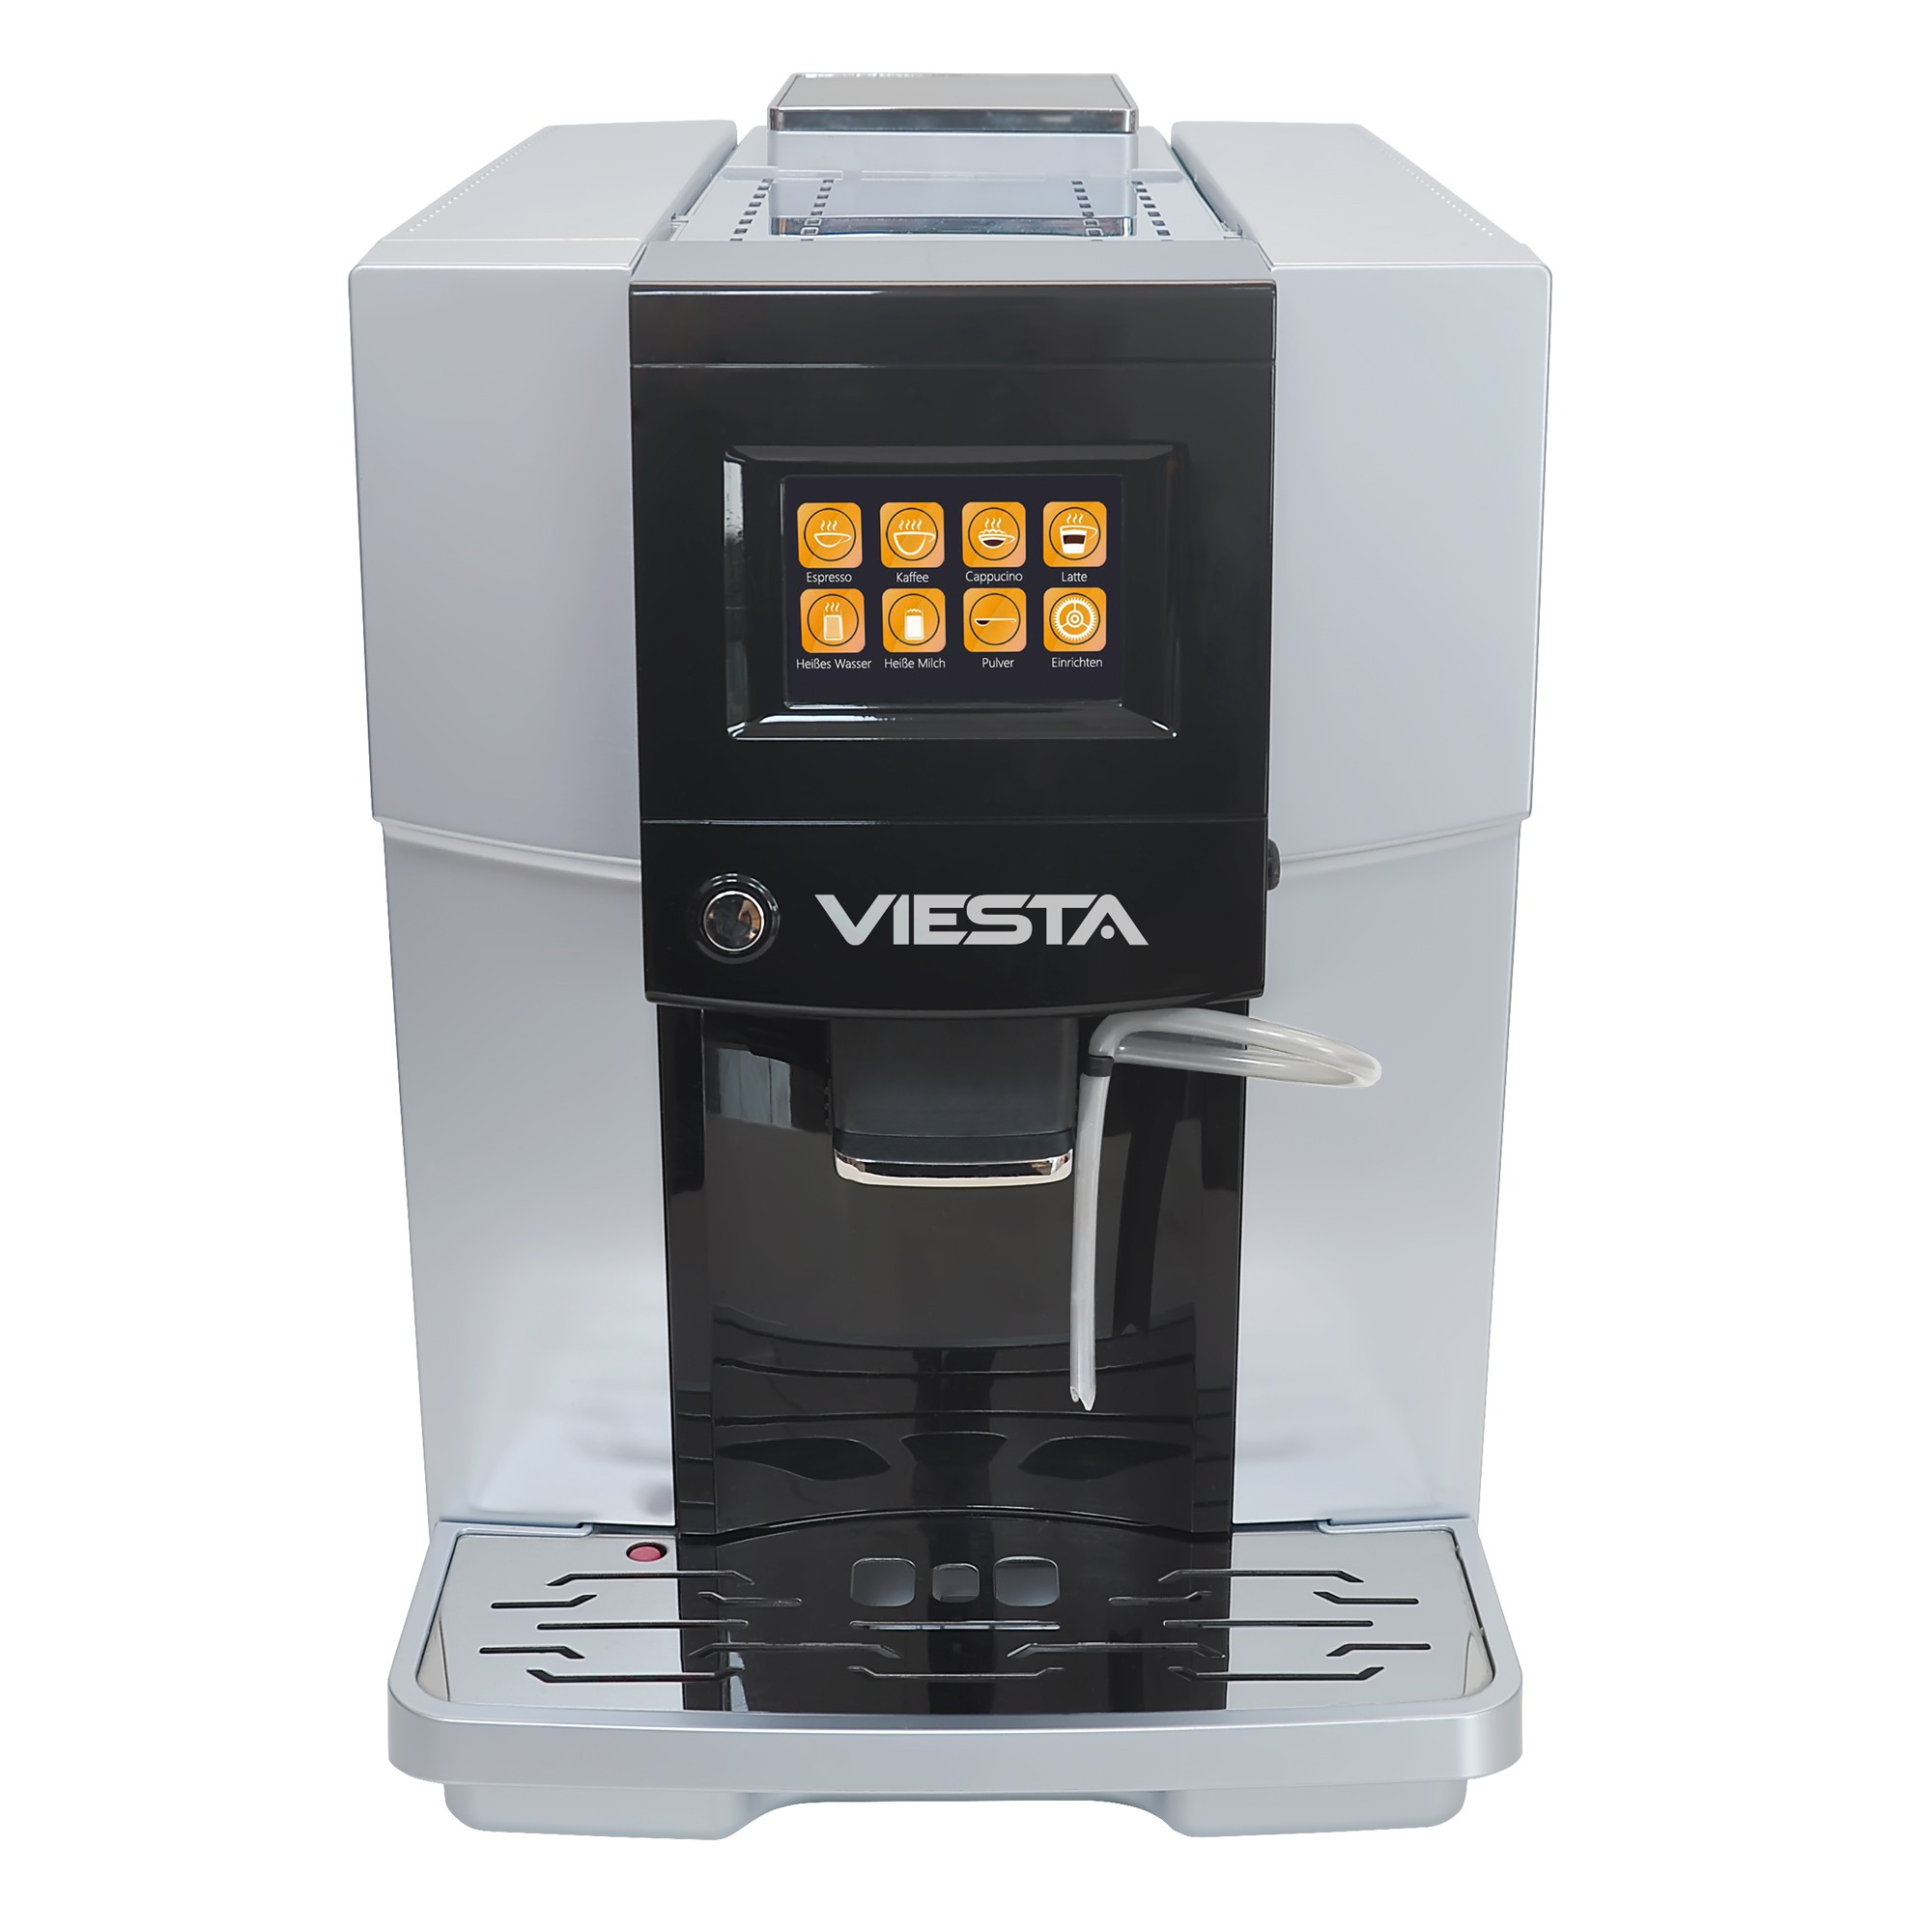 Viesta one touch 500 kaffeevollautomat kaffeemaschine mit for Kaffeevollautomat 200